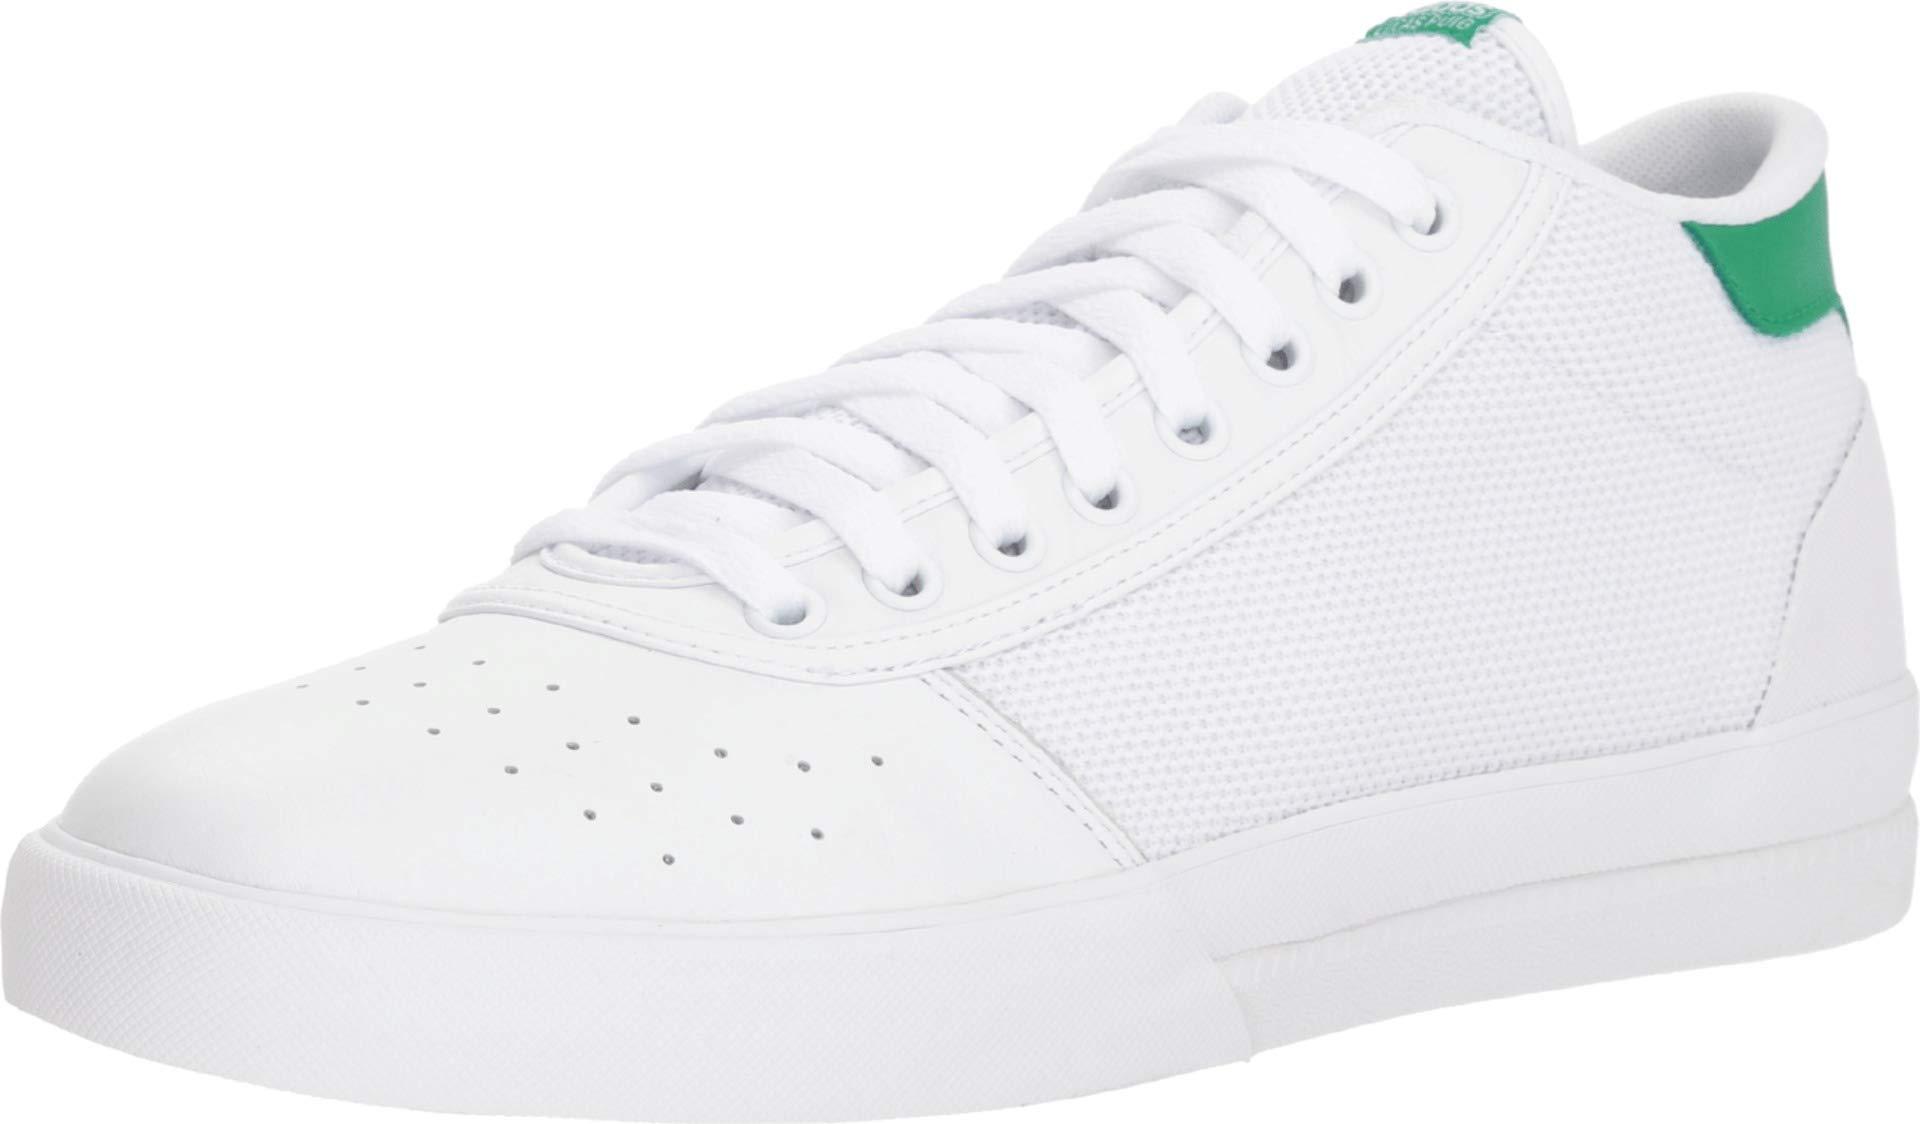 43a9e74d98e81 adidas Skateboarding Men's Lucas Premiere Mid White/White/Green 10 D US